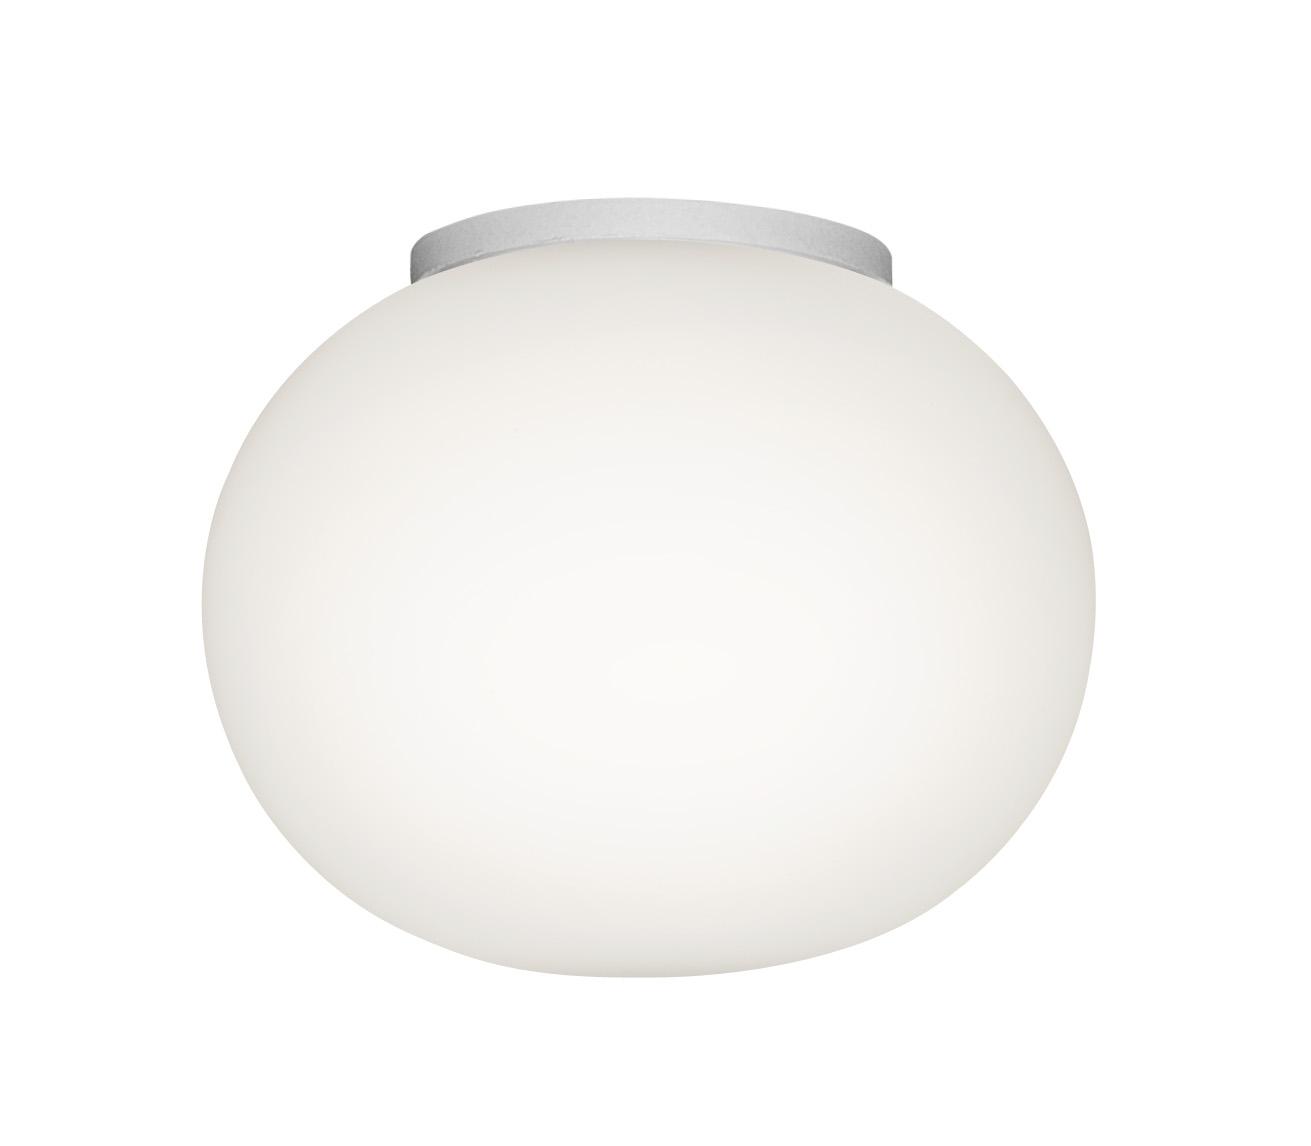 Mini glo-ball ceiling/wall